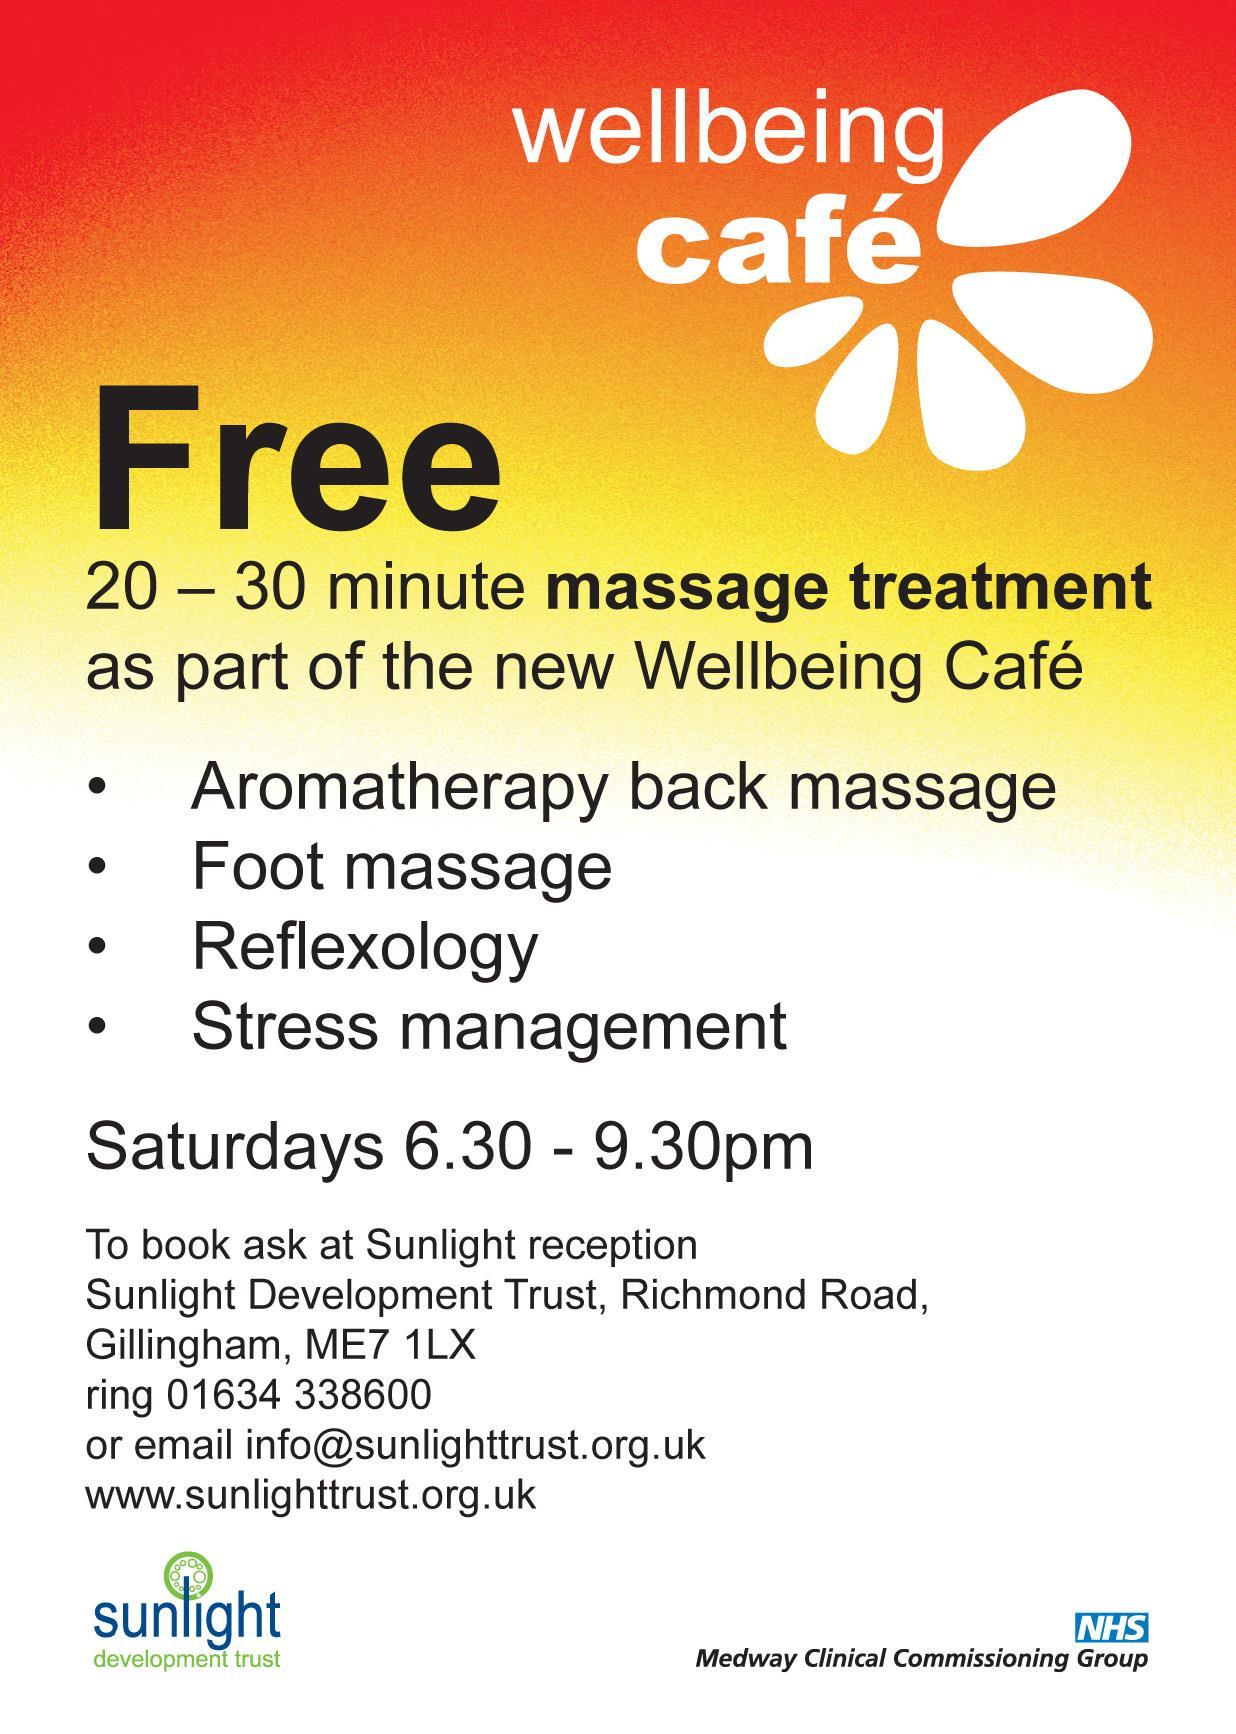 Free massage treatment